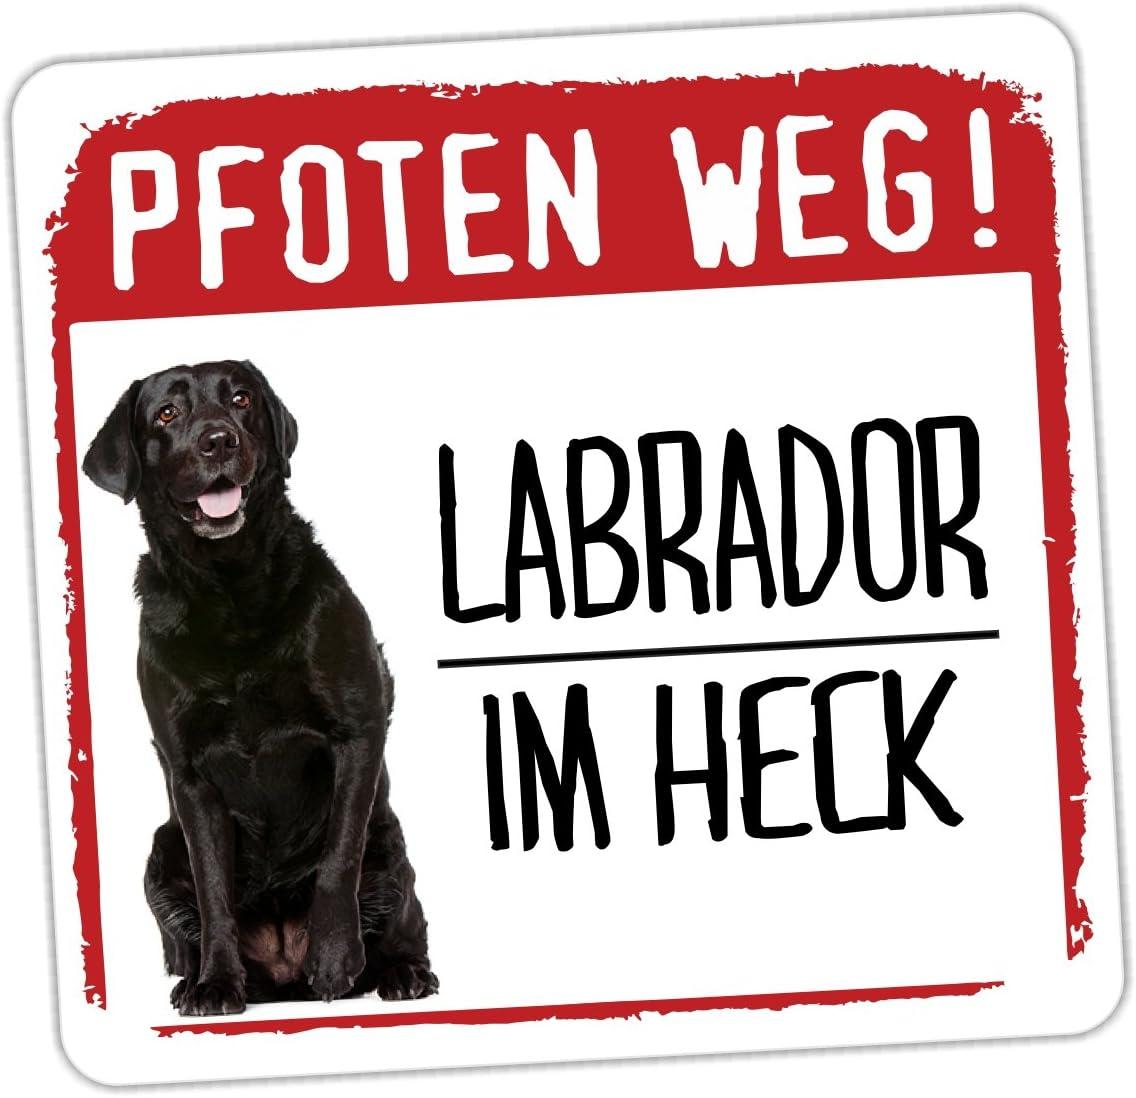 Black Lab Labrador Pfoten Weg Siviwonder Auto Aufkleber Hundeaufkleber Reflektierend Auto